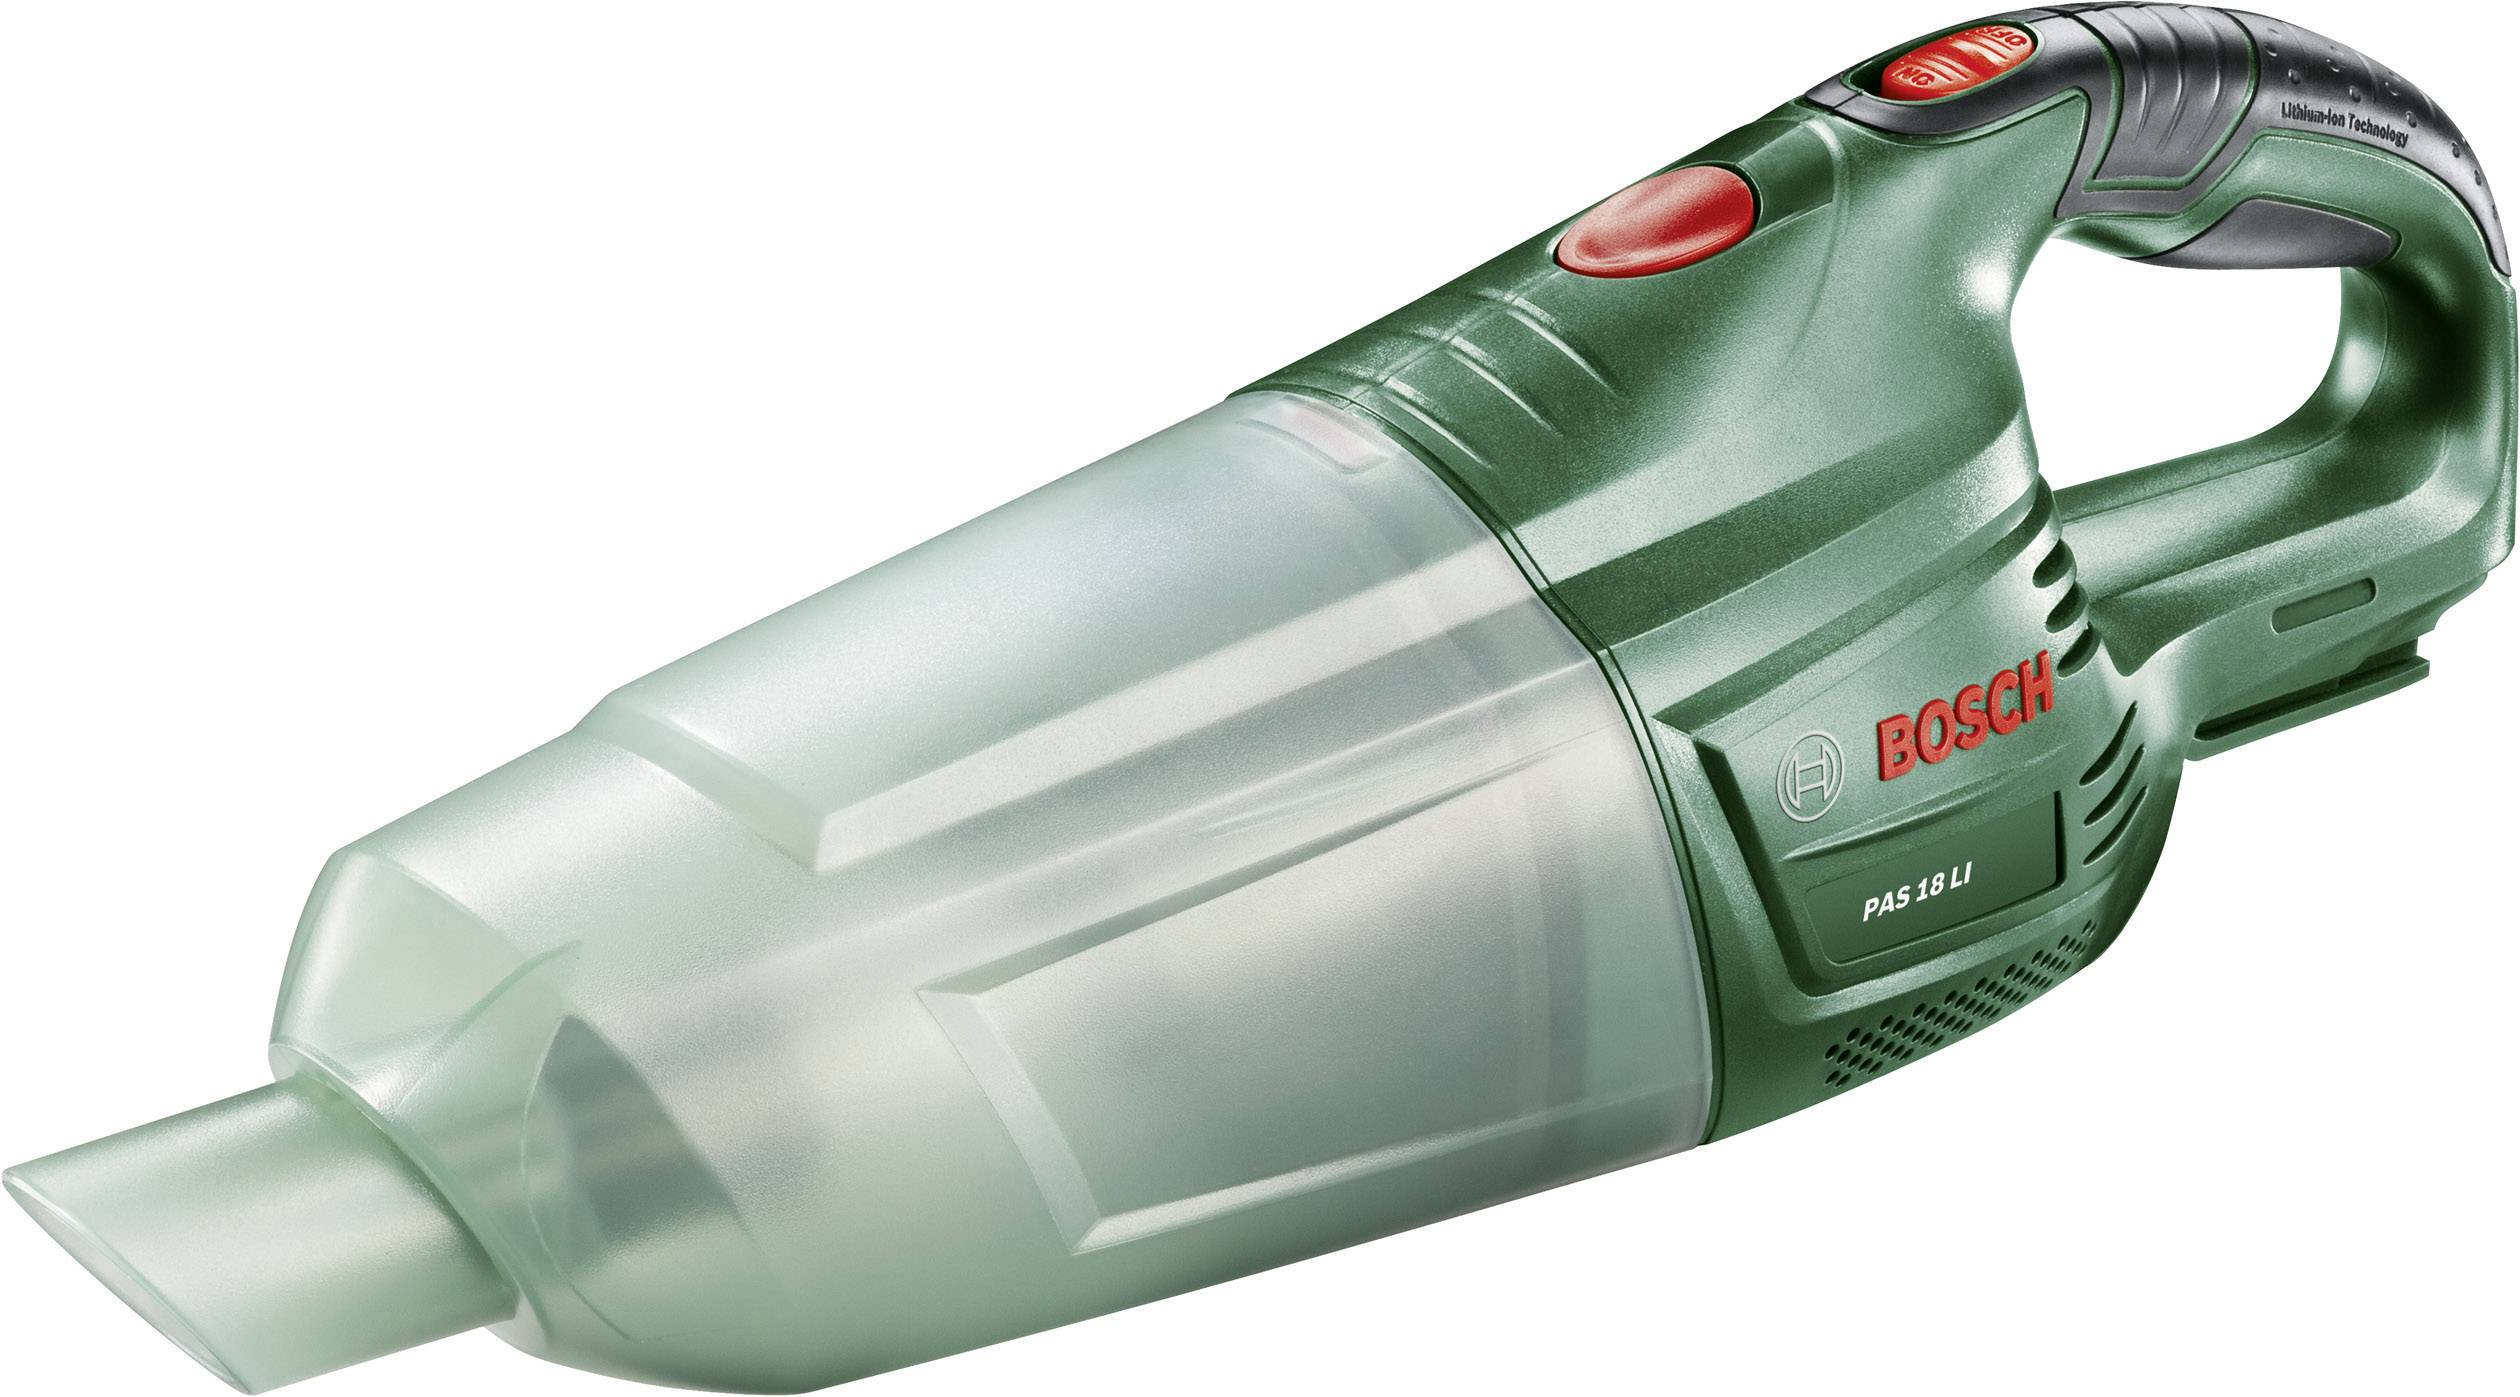 Aspirapolvere a batterie Bosch Home